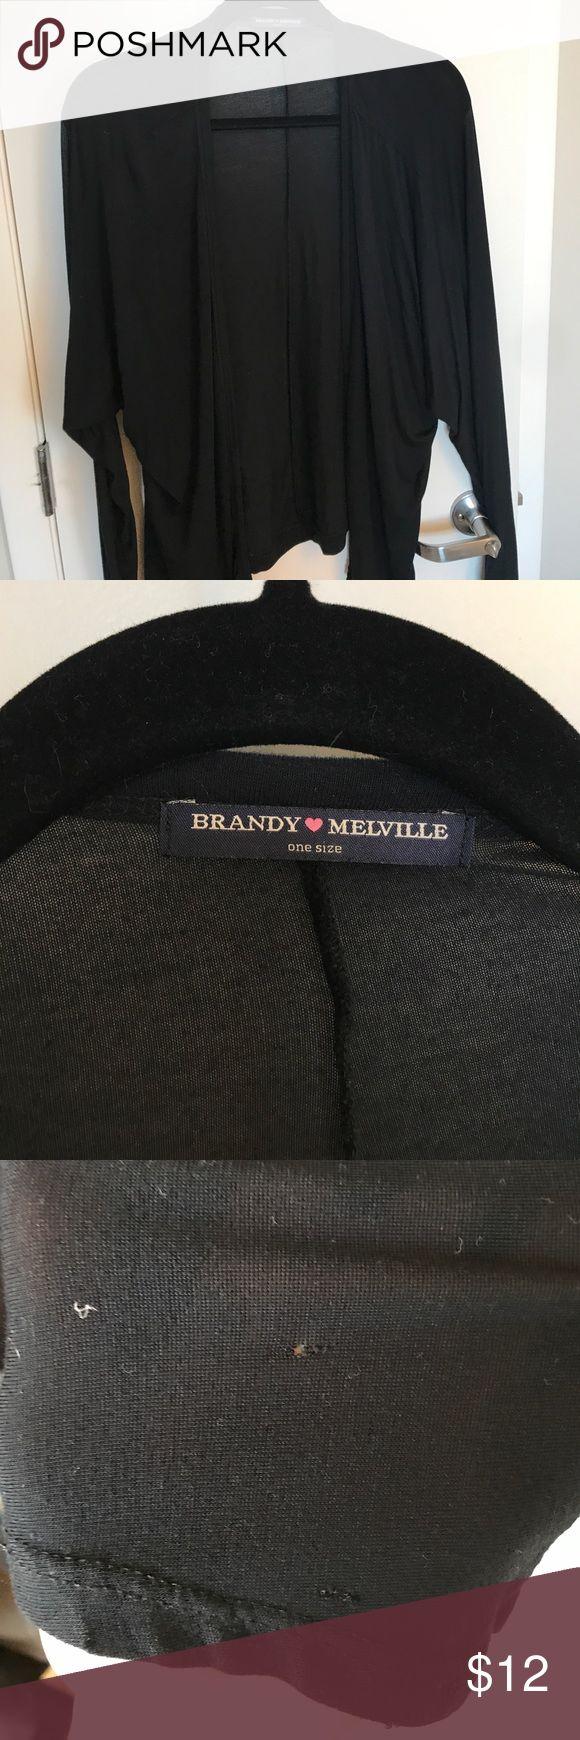 Brandy Melville Cardigan Black few flaws on sleeve not major super cute Brandy Melville Sweaters